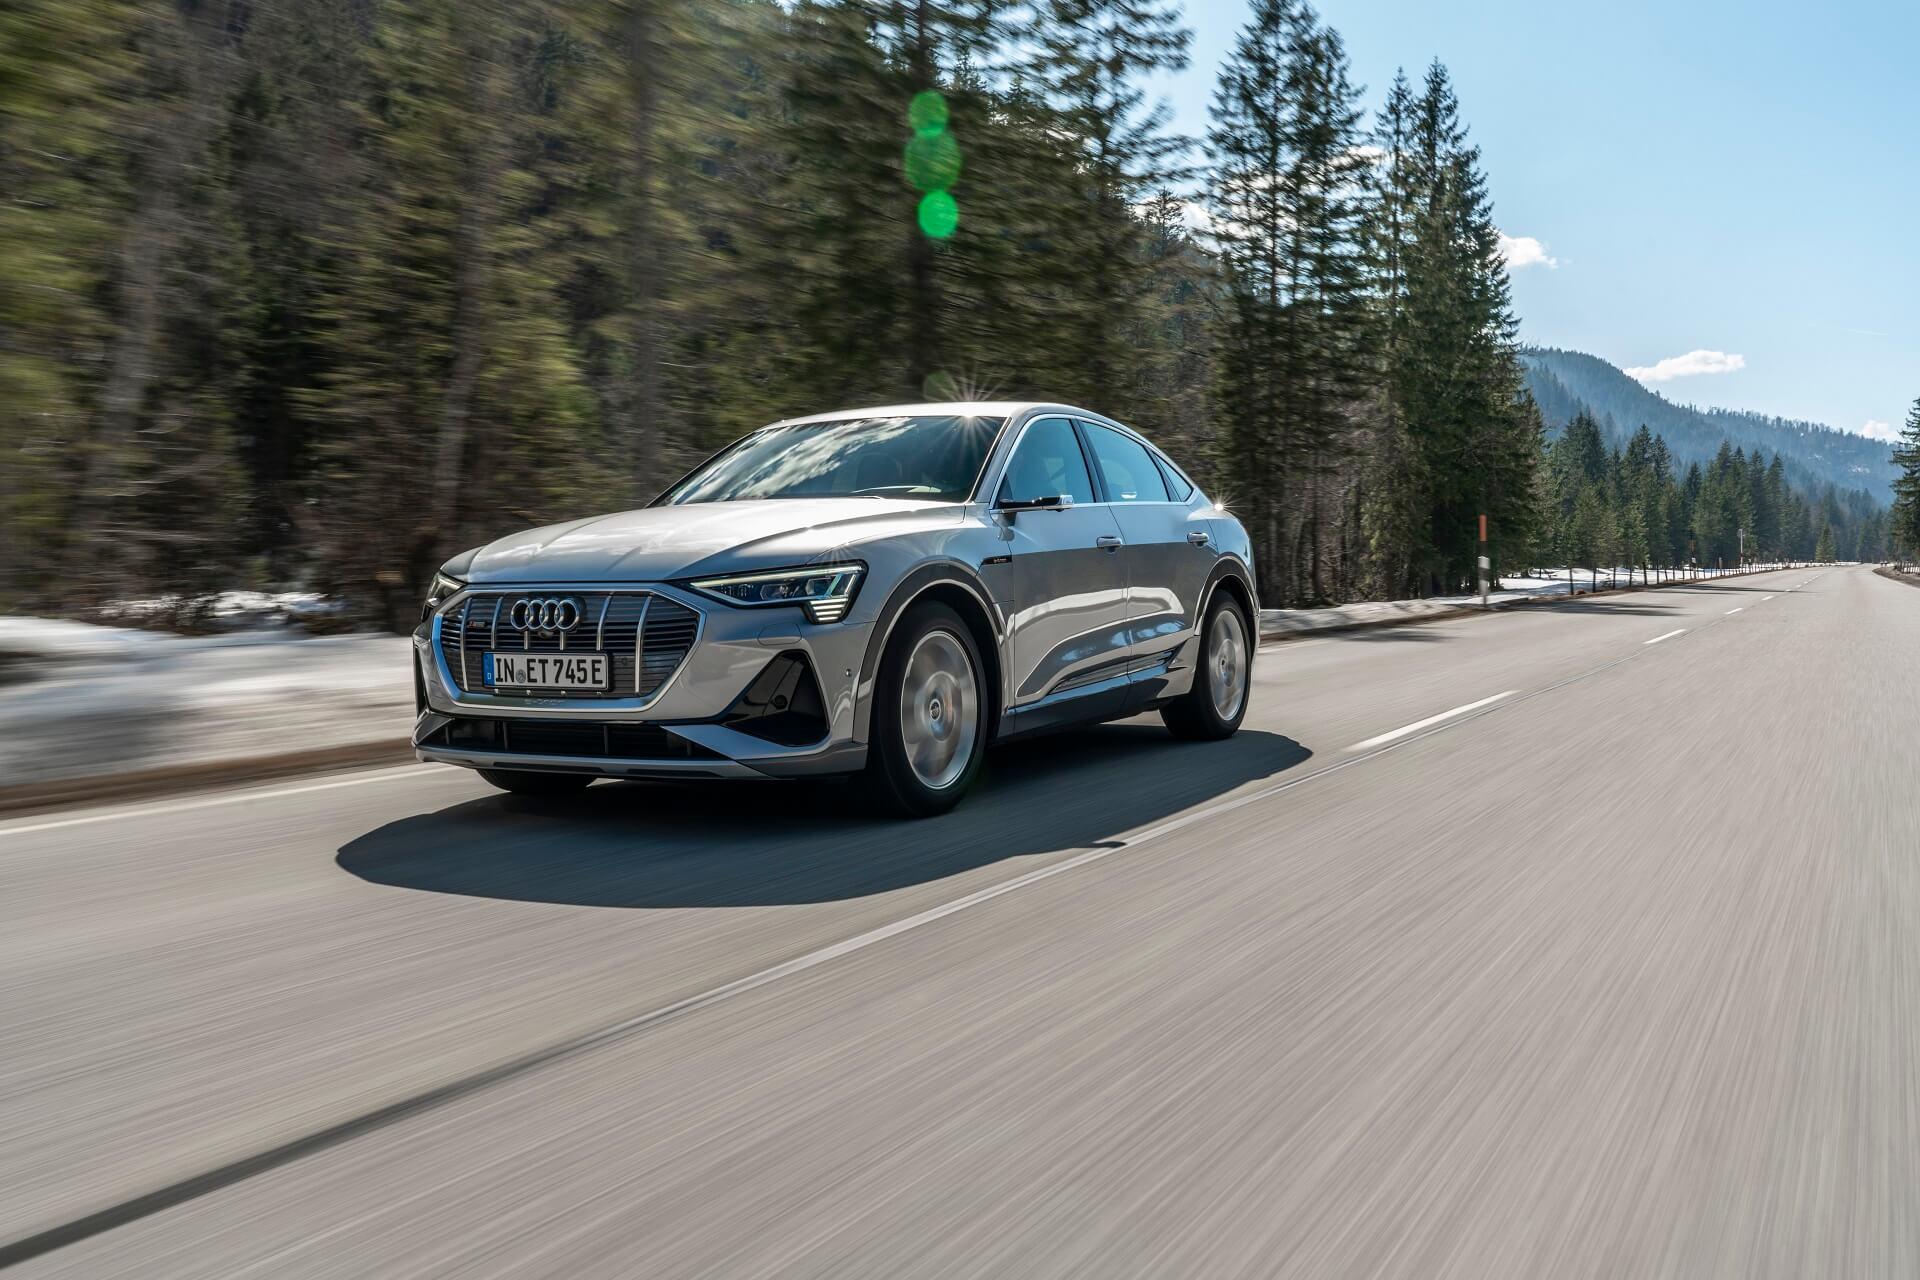 Audi e-tron Sportback - Σπορ χαρακτήρας